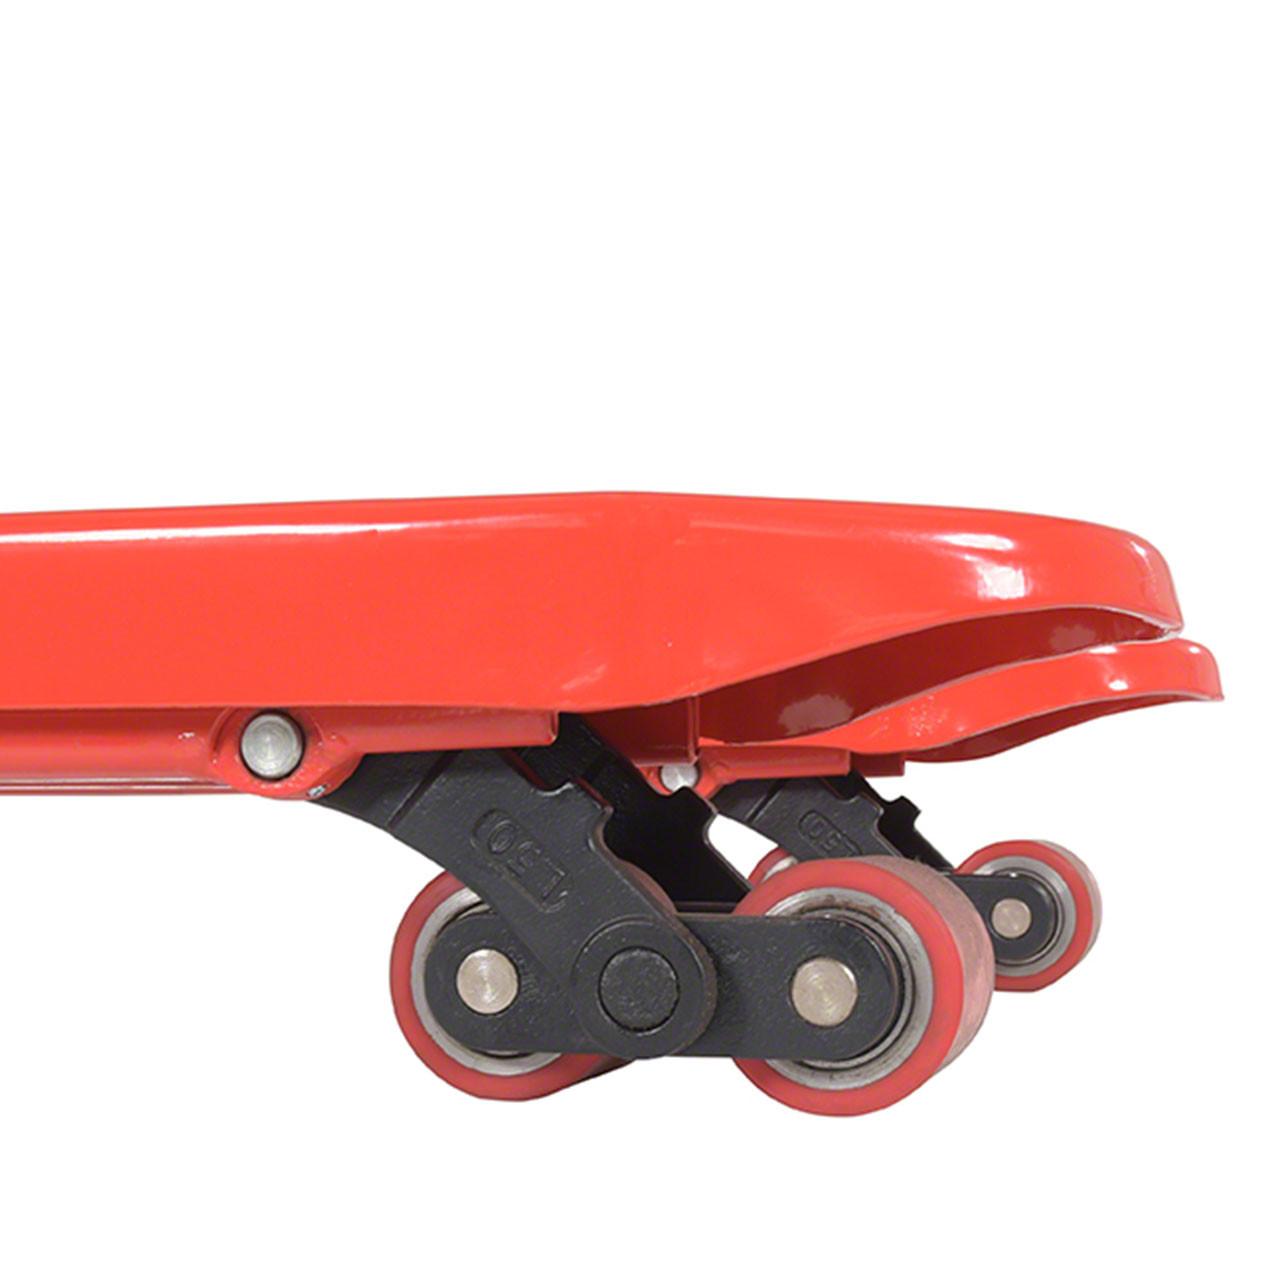 Wheels provide smooth transportation